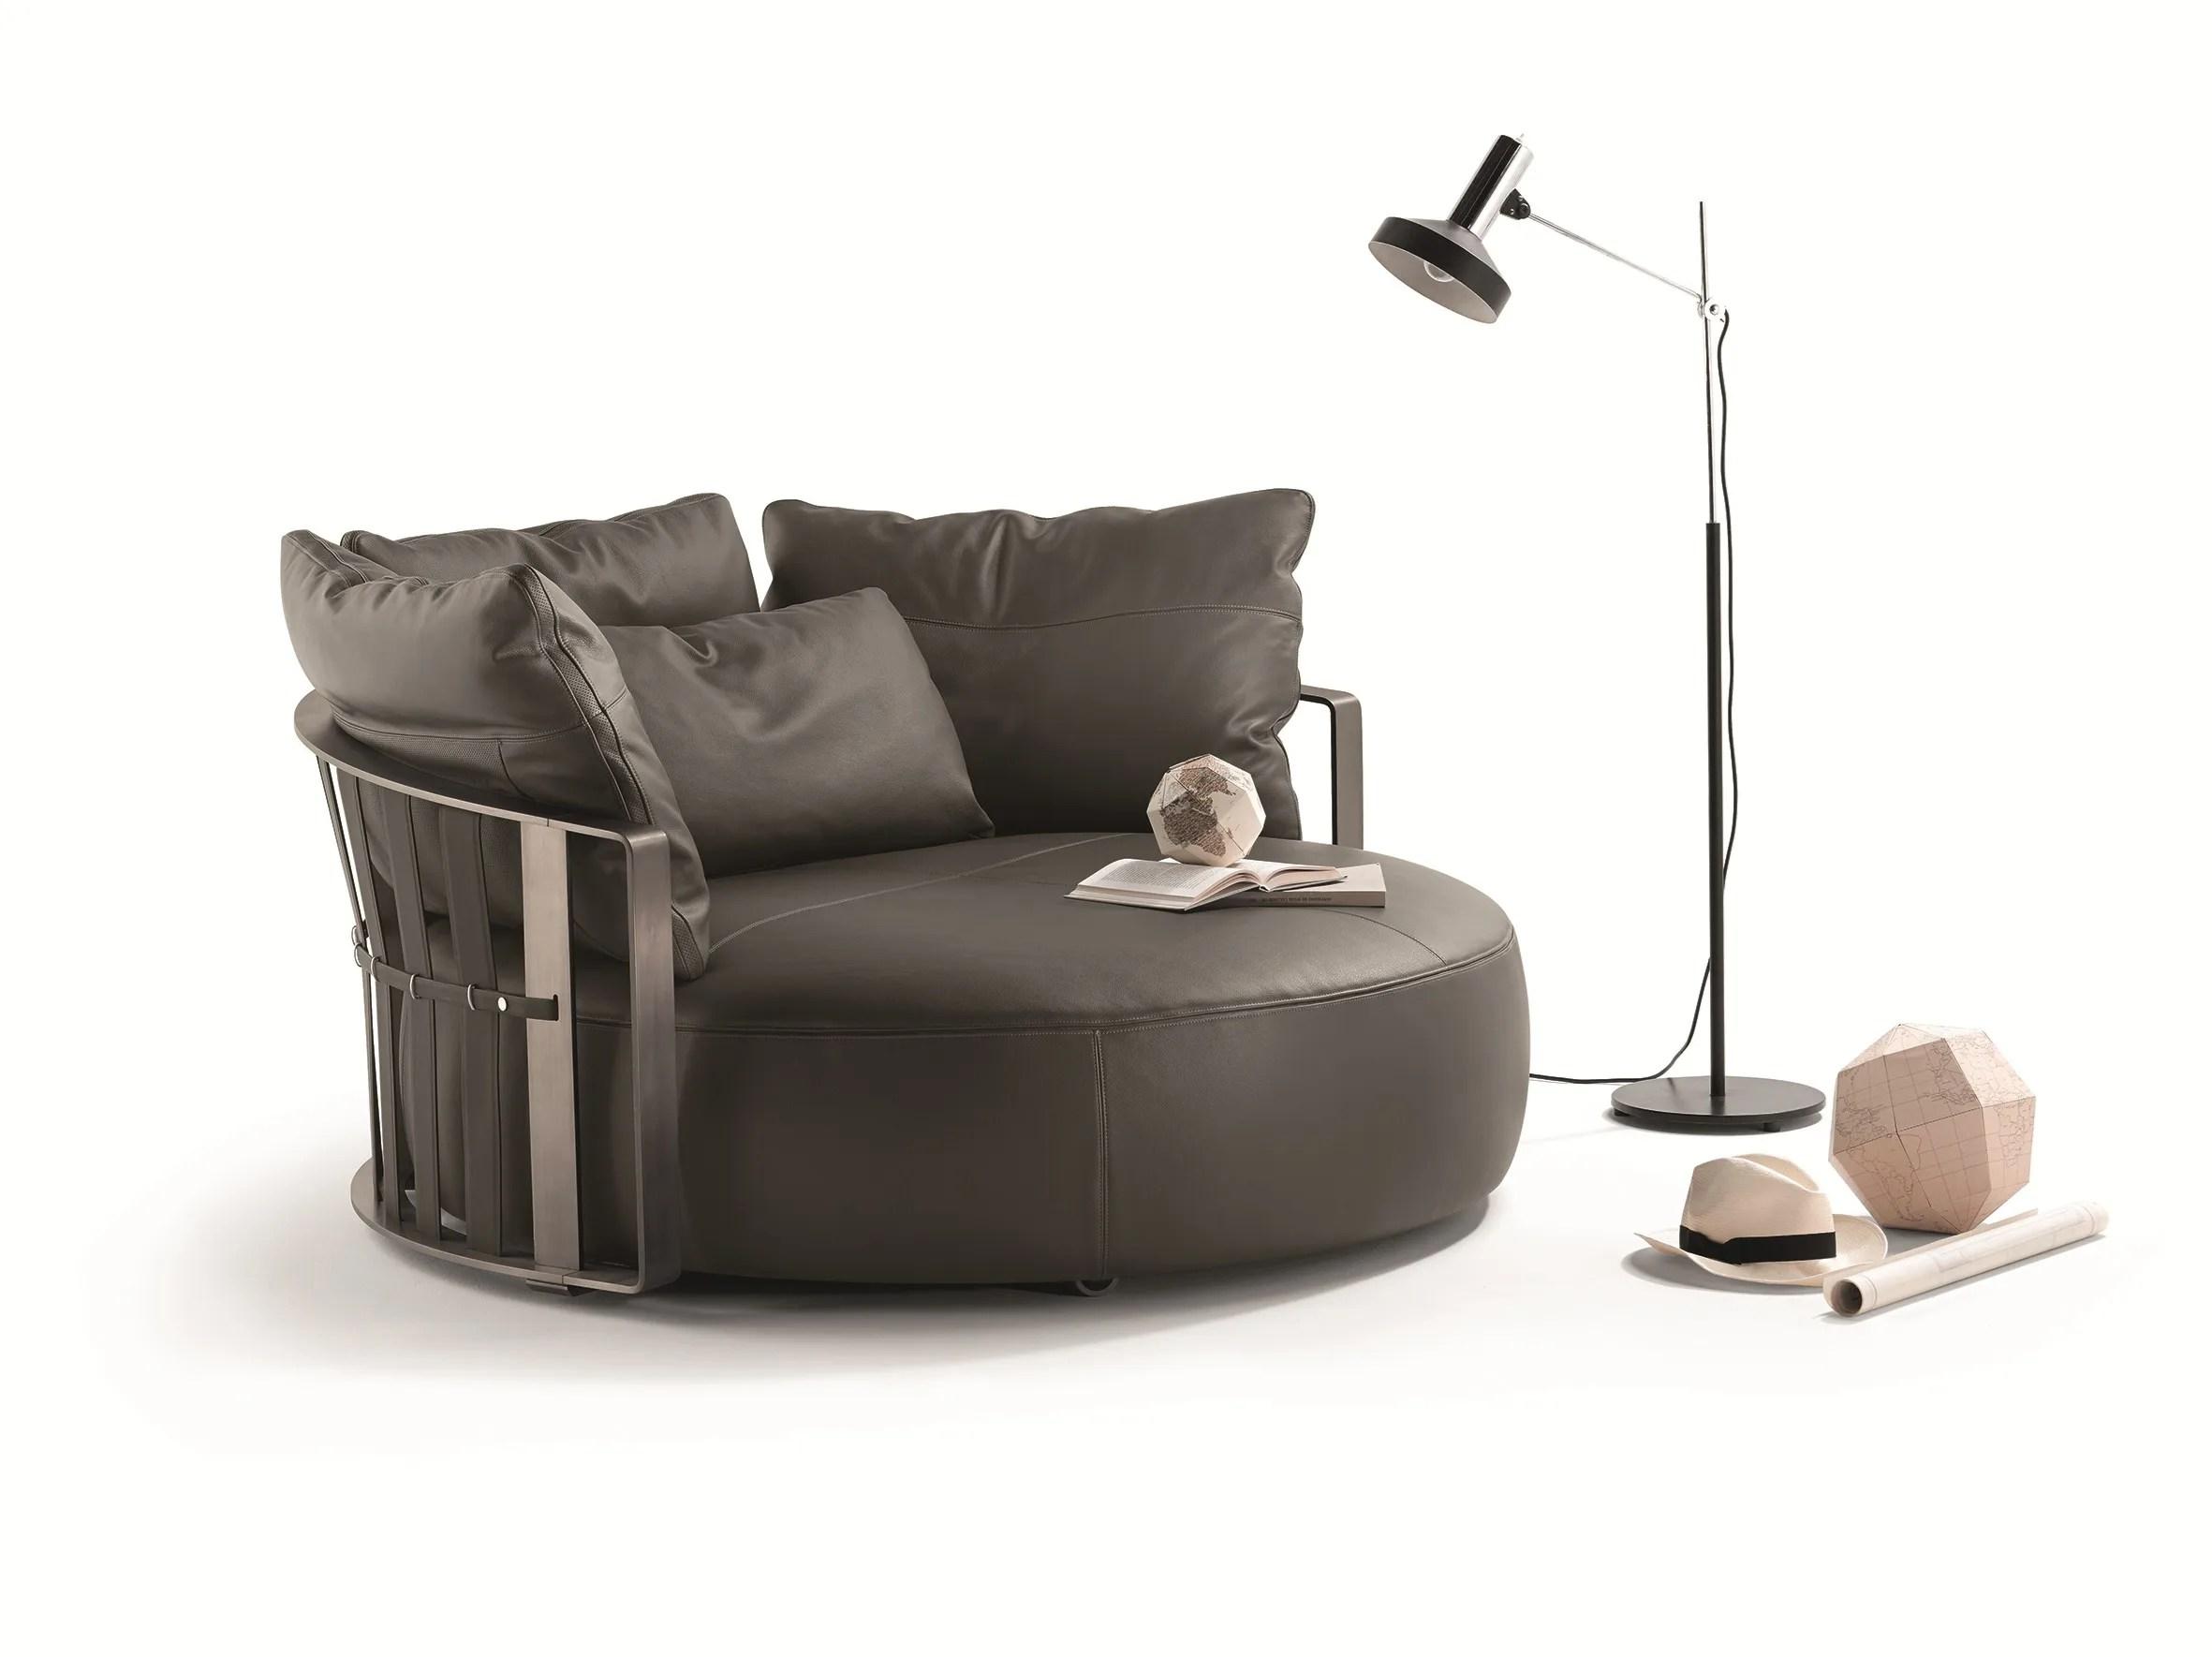 poltrona frau sofa kennedee sleeper brand reviews round scarlett by design jean marie massaud